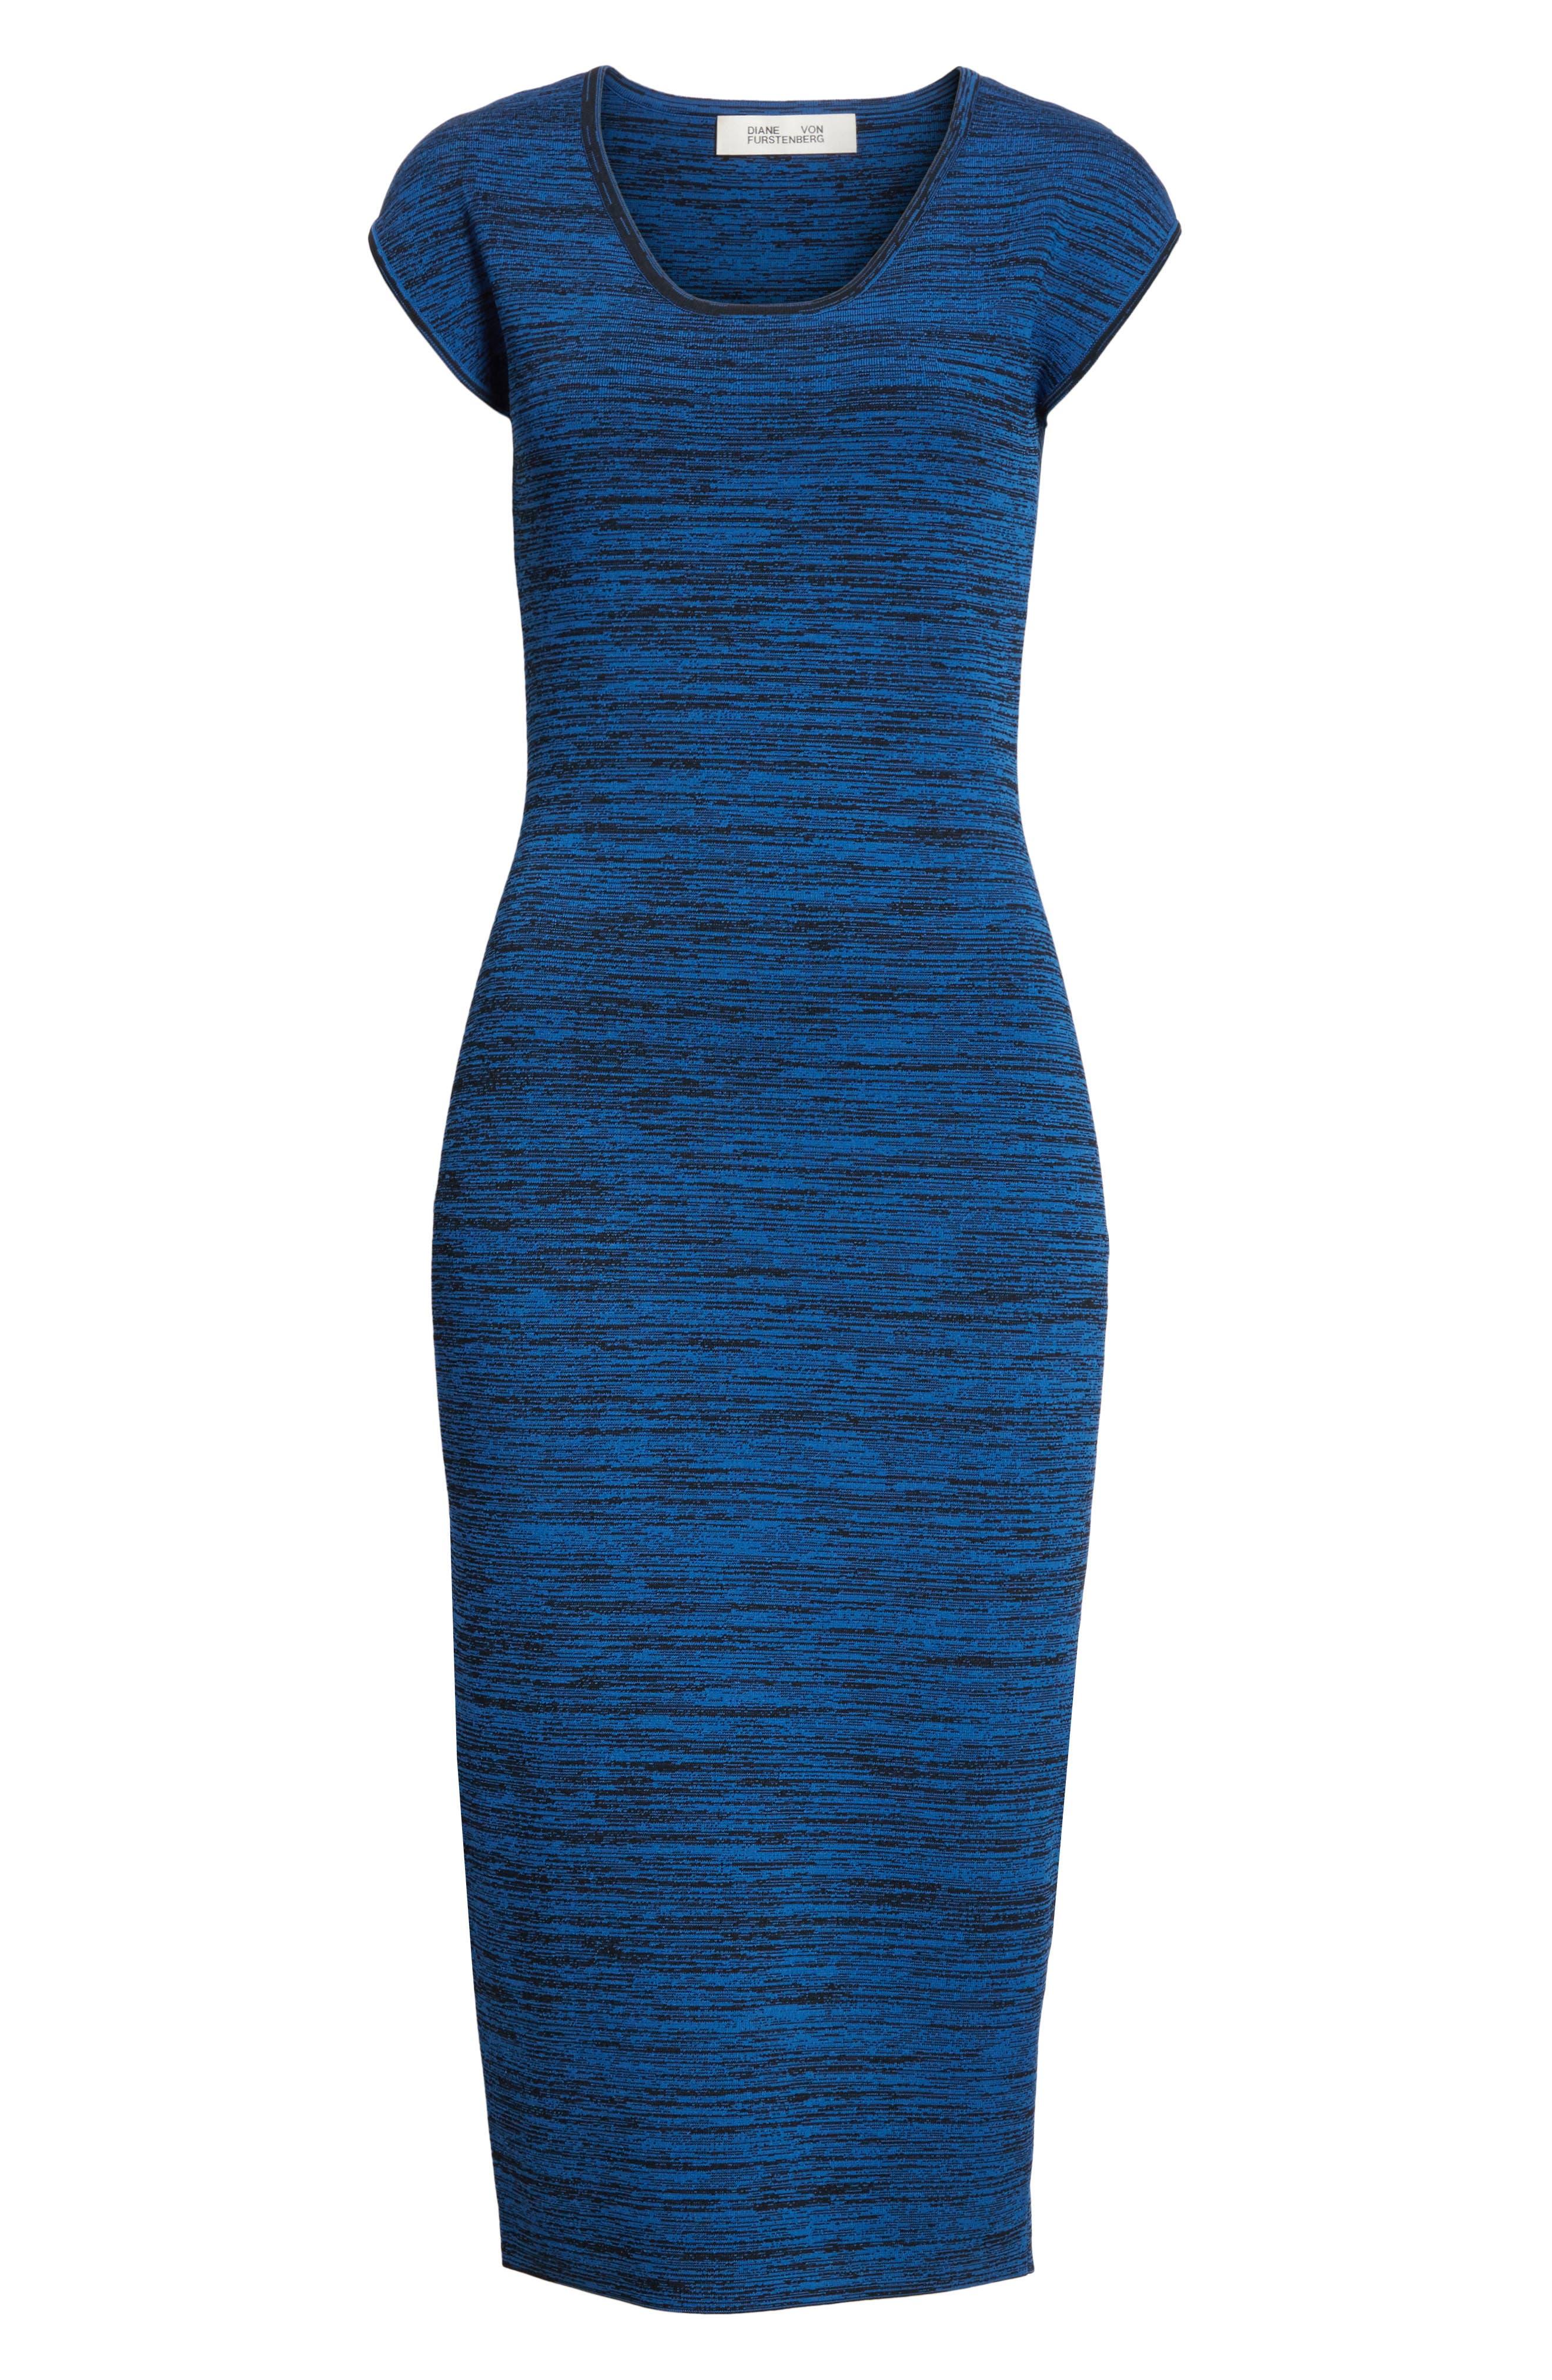 Diane von Furstenberg Sweater Dress,                             Alternate thumbnail 6, color,                             429